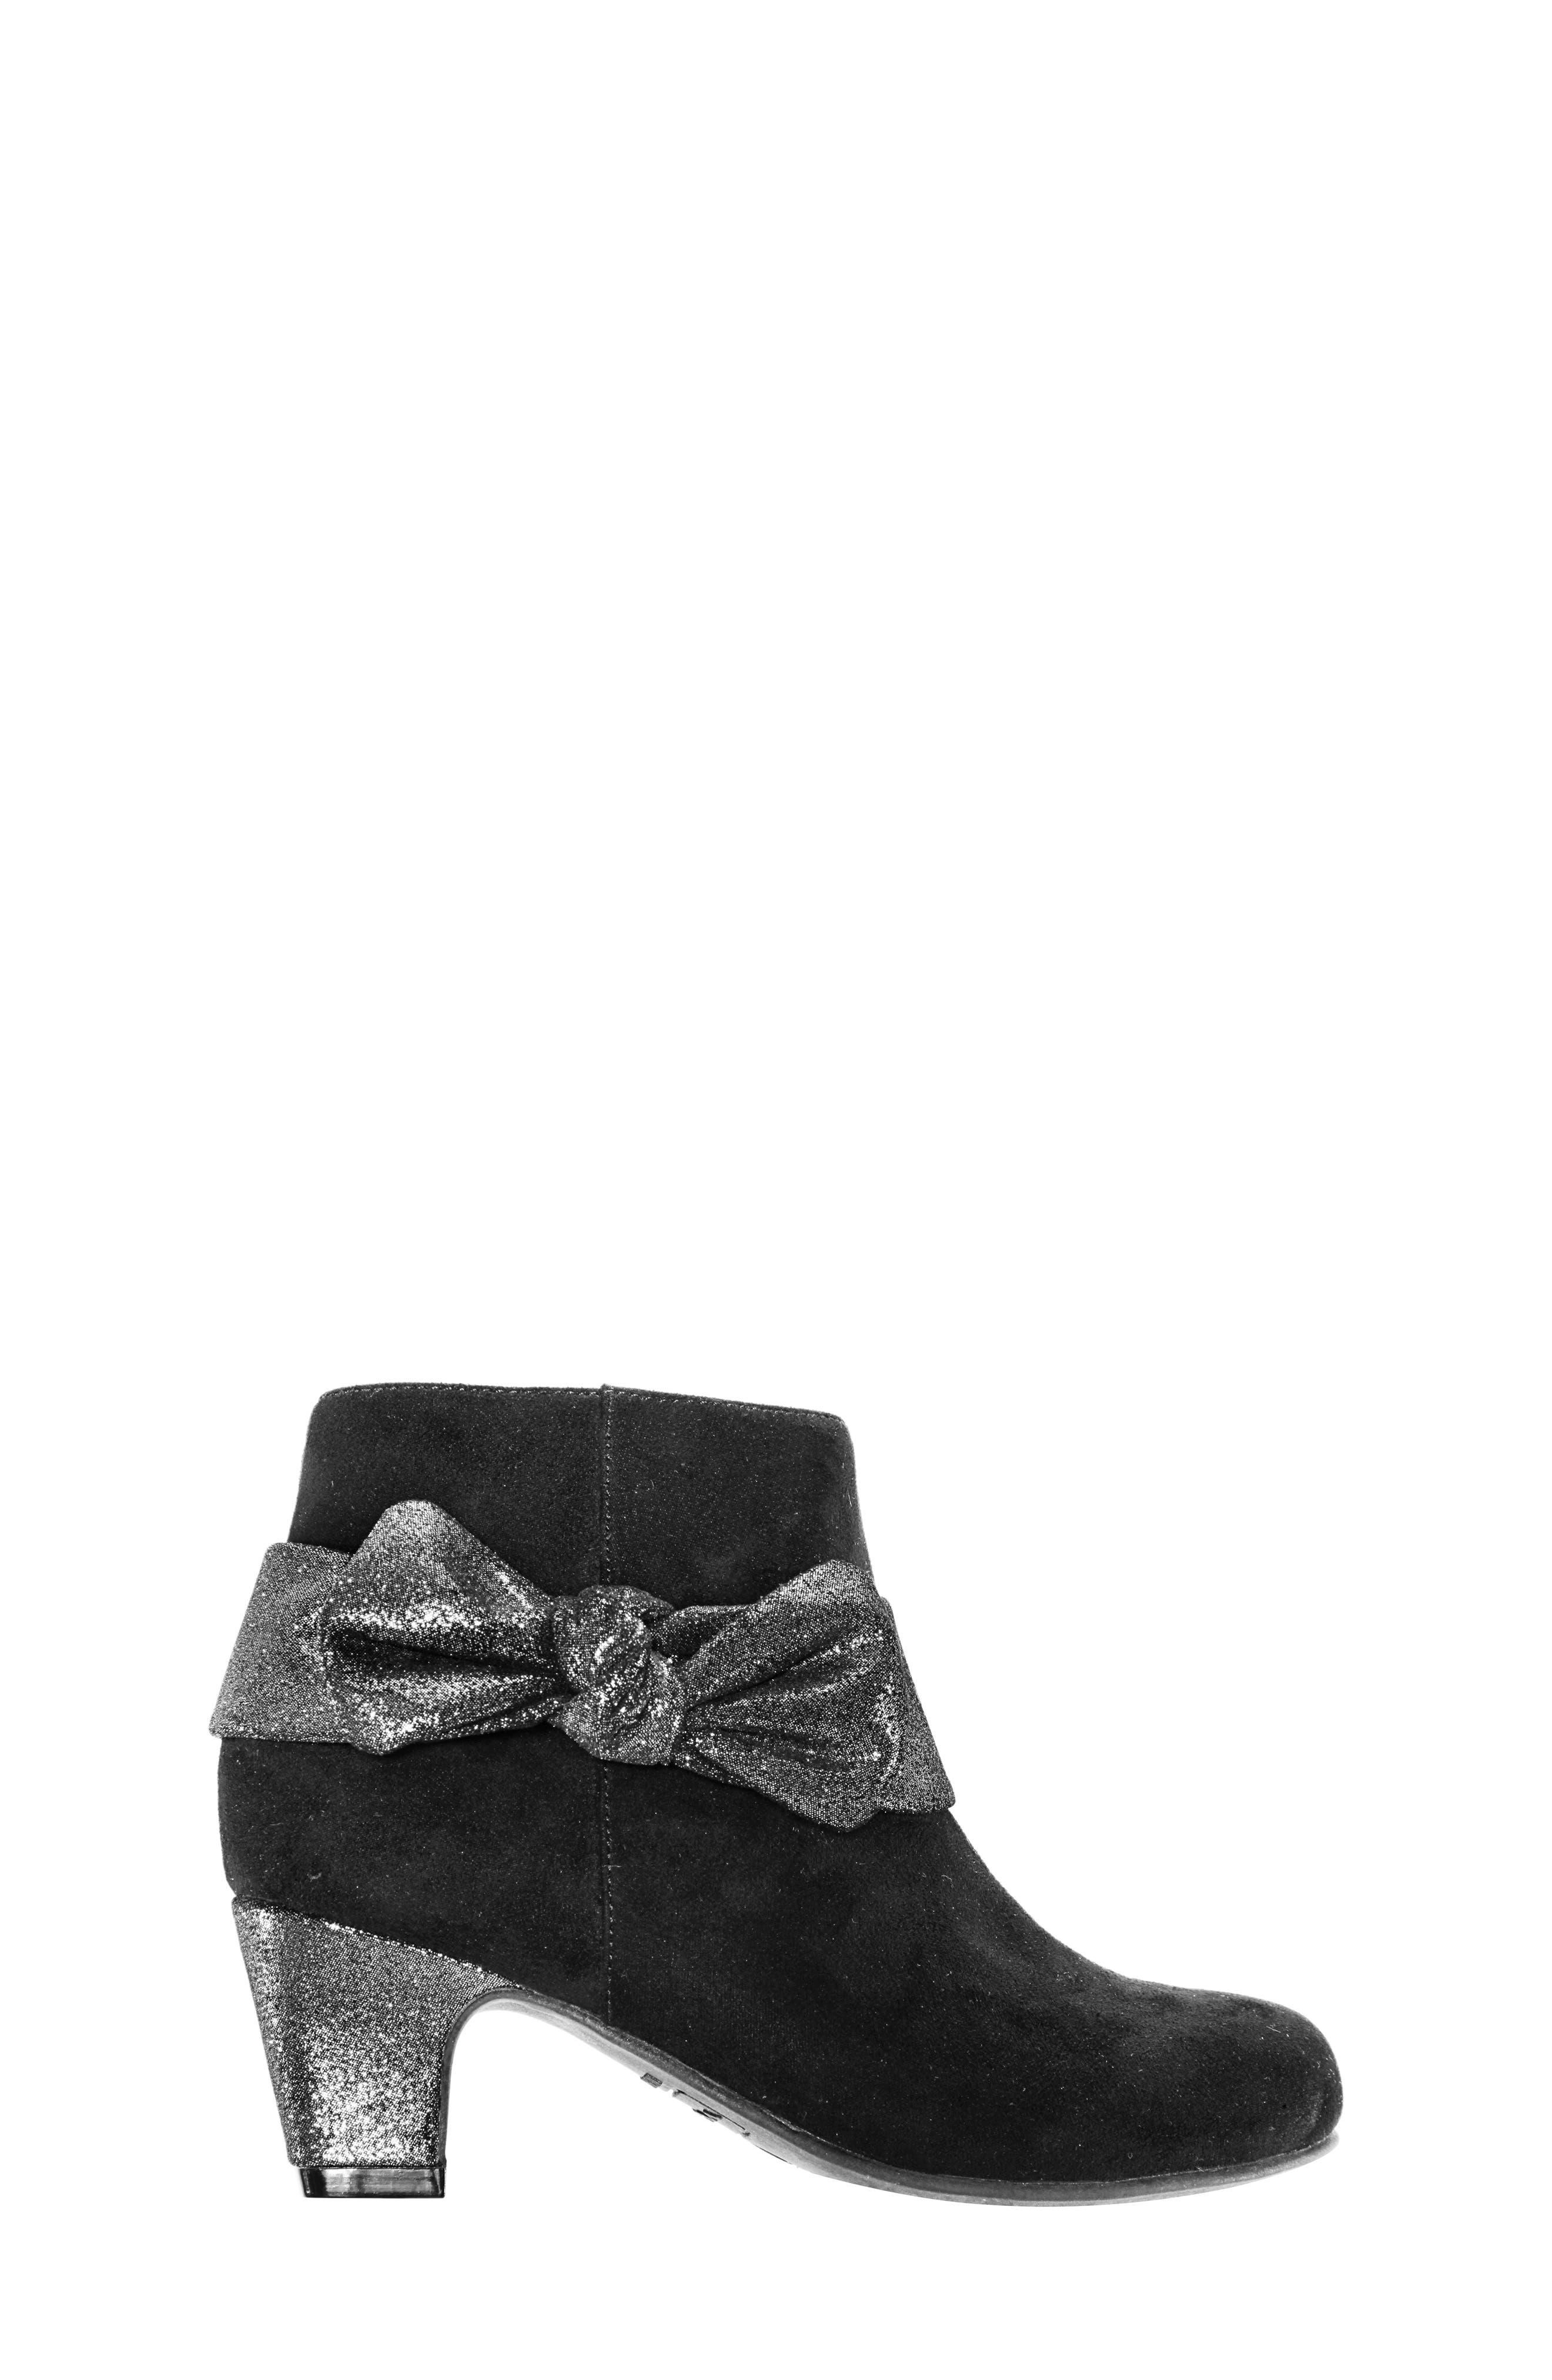 Evelin Block Heel Bootie,                             Alternate thumbnail 8, color,                             BLACK MICRO SUEDE